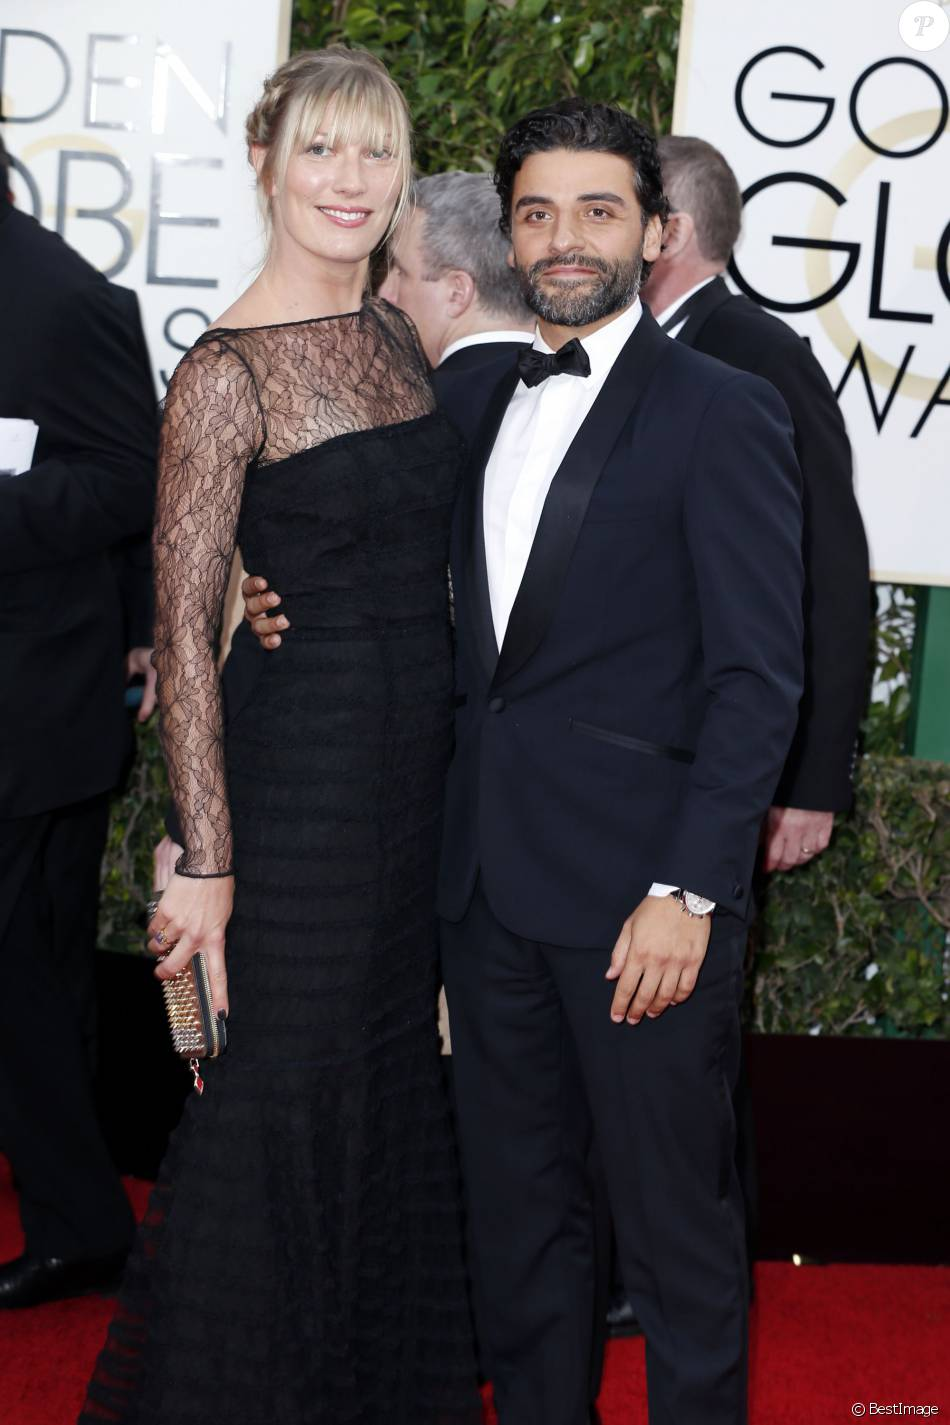 Oscar Isaac et sa compagne Elvira Lind - La 73e cérémonie annuelle des Golden Globe Awards à Beverly Hills, le 10 janvier 2016. © Olivier Borde/Bestimage